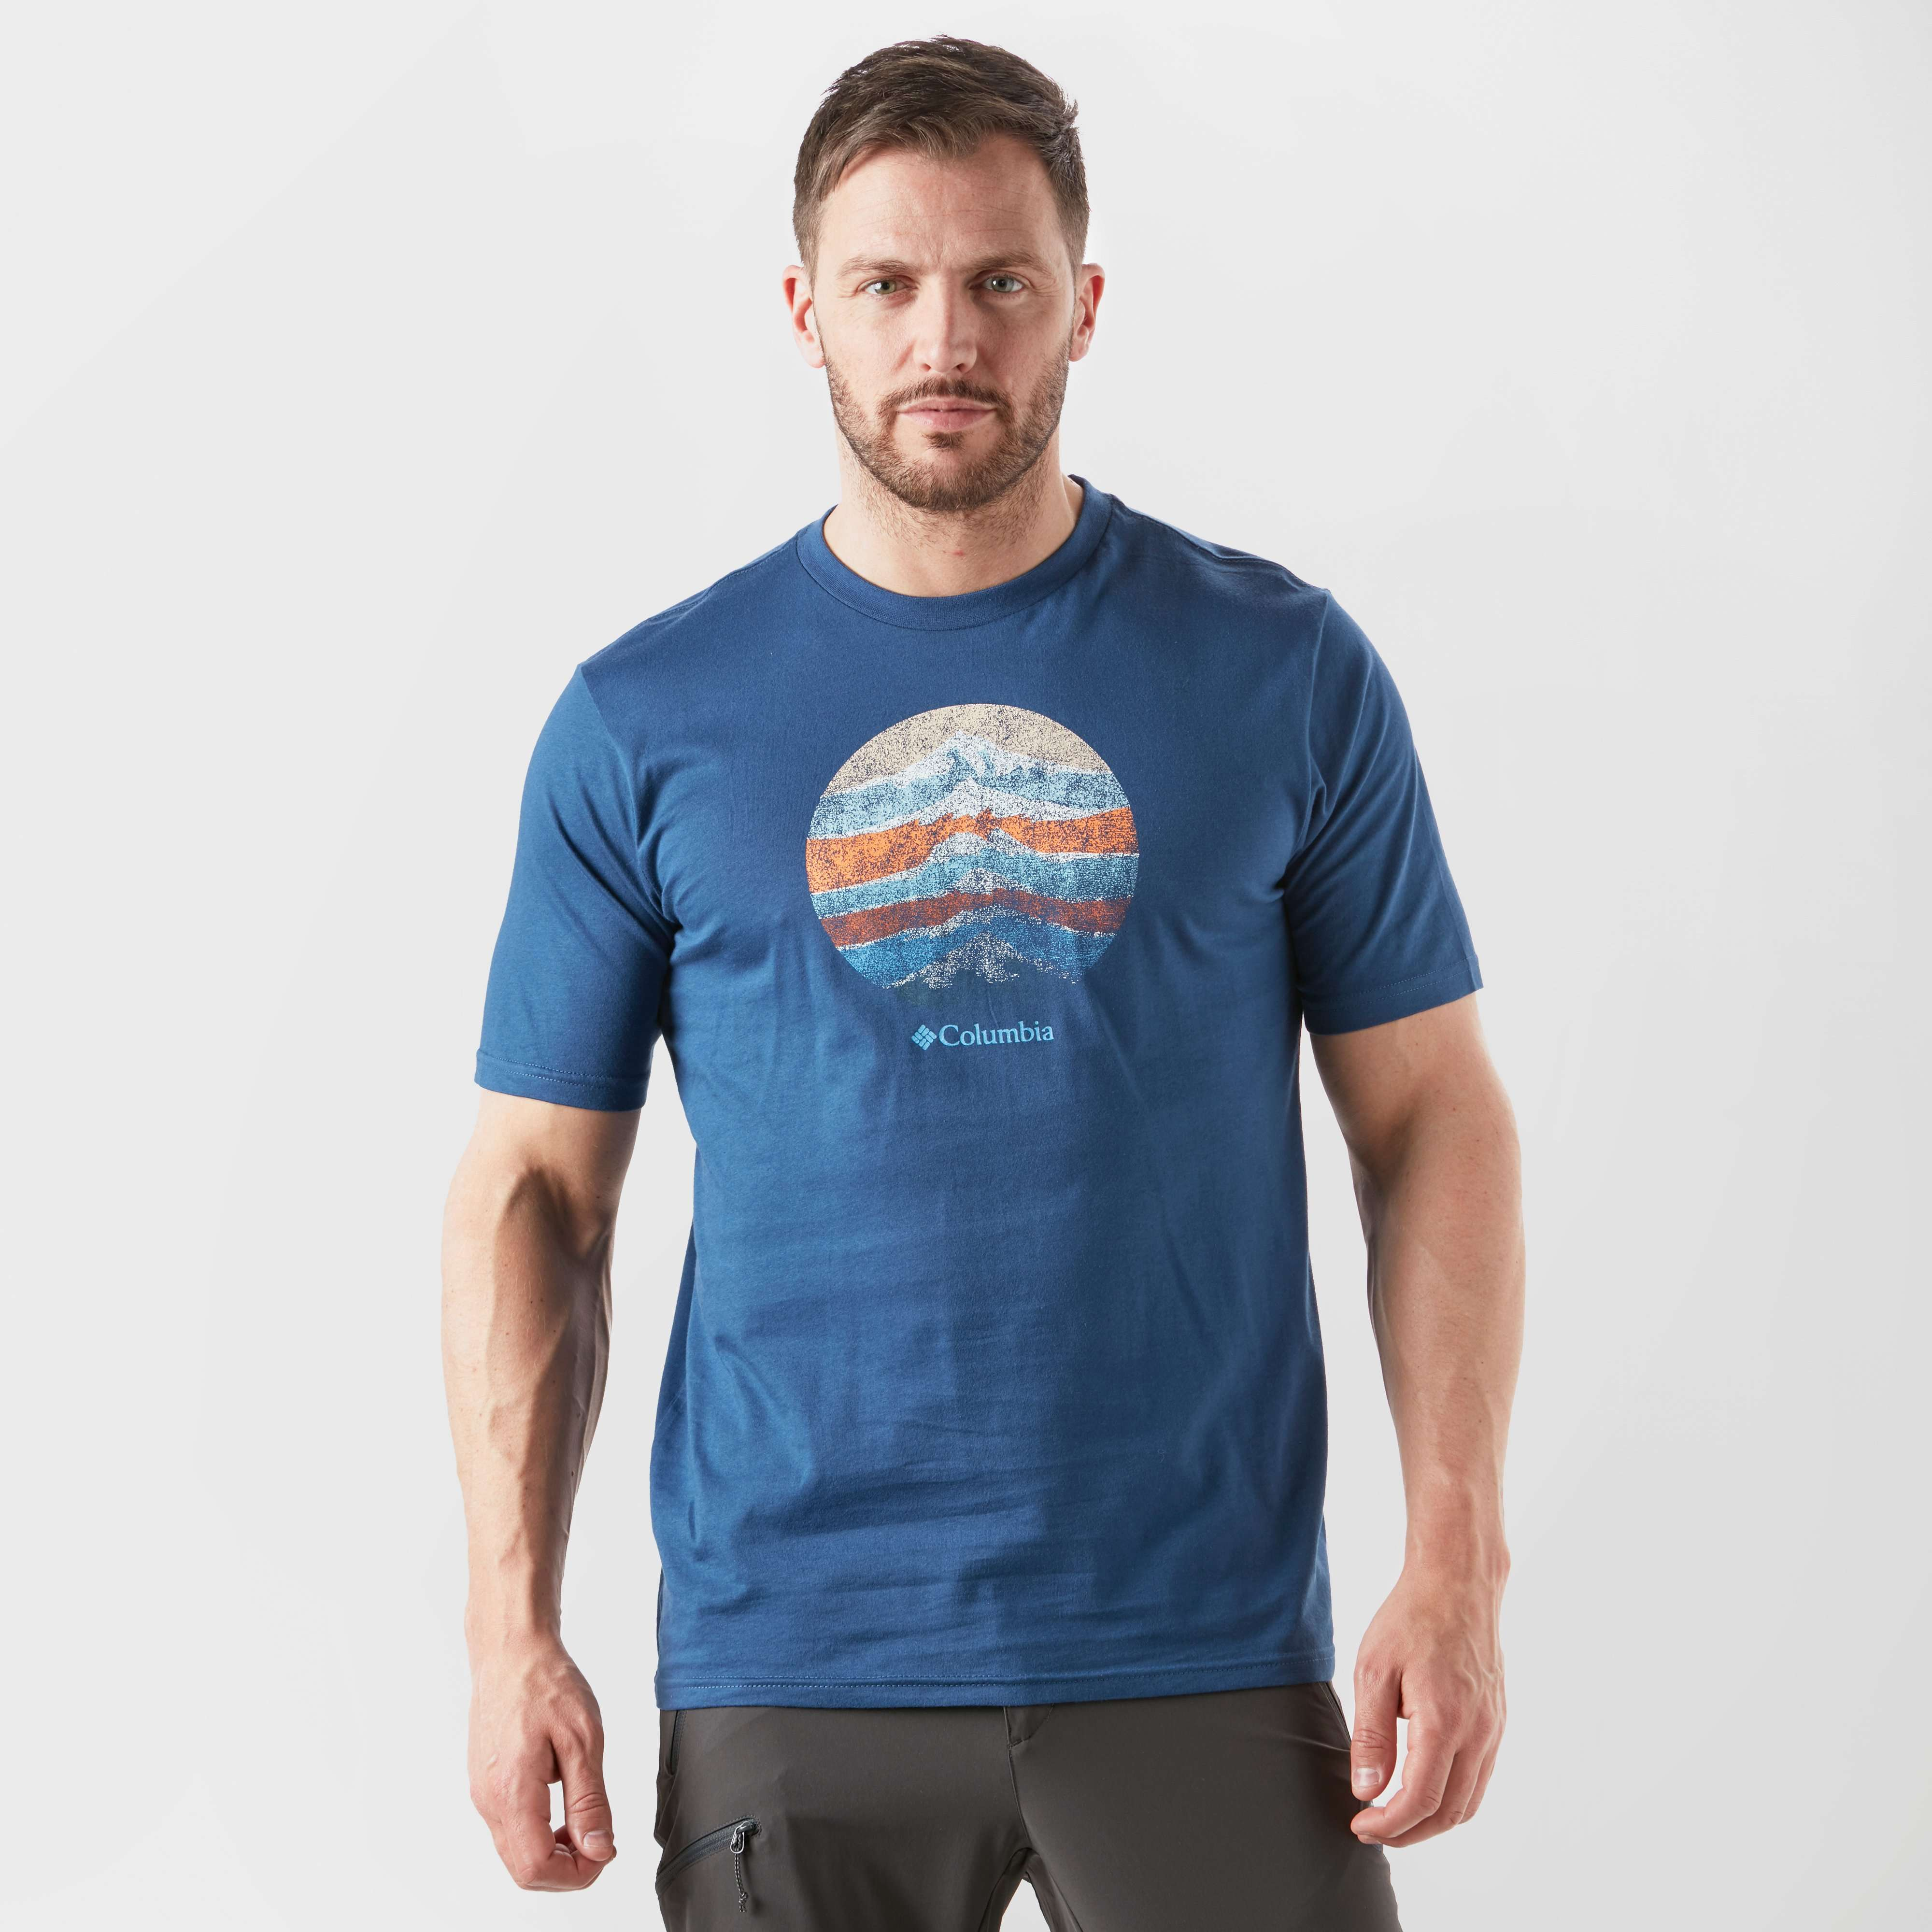 COLUMBIA Short Sleeve Mountain Logo T-Shirt